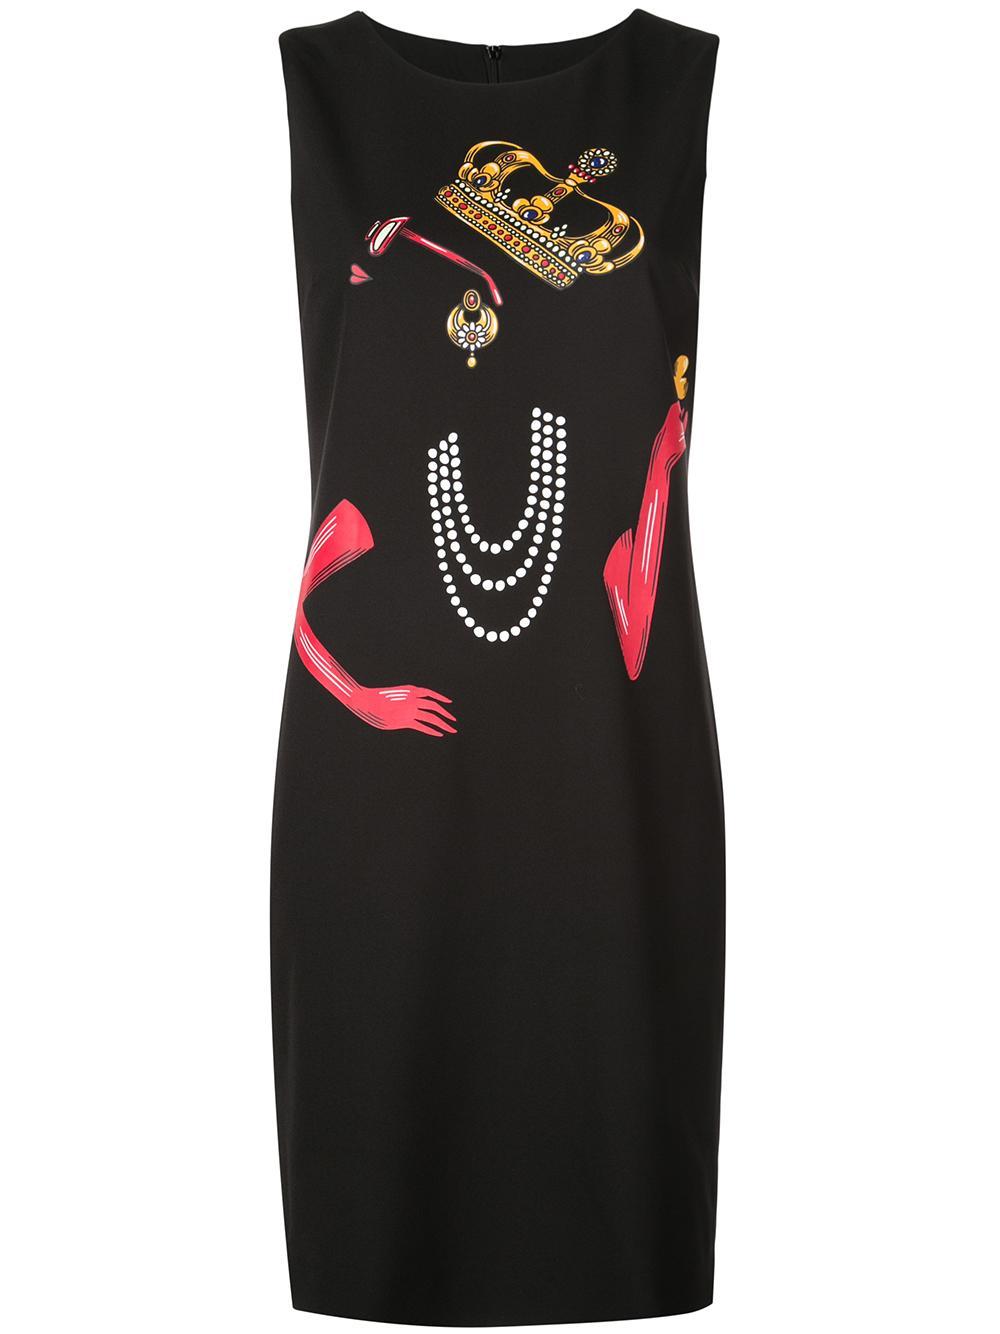 Sleeveless Crepe Print Sheath Dress Item # 0451-6134